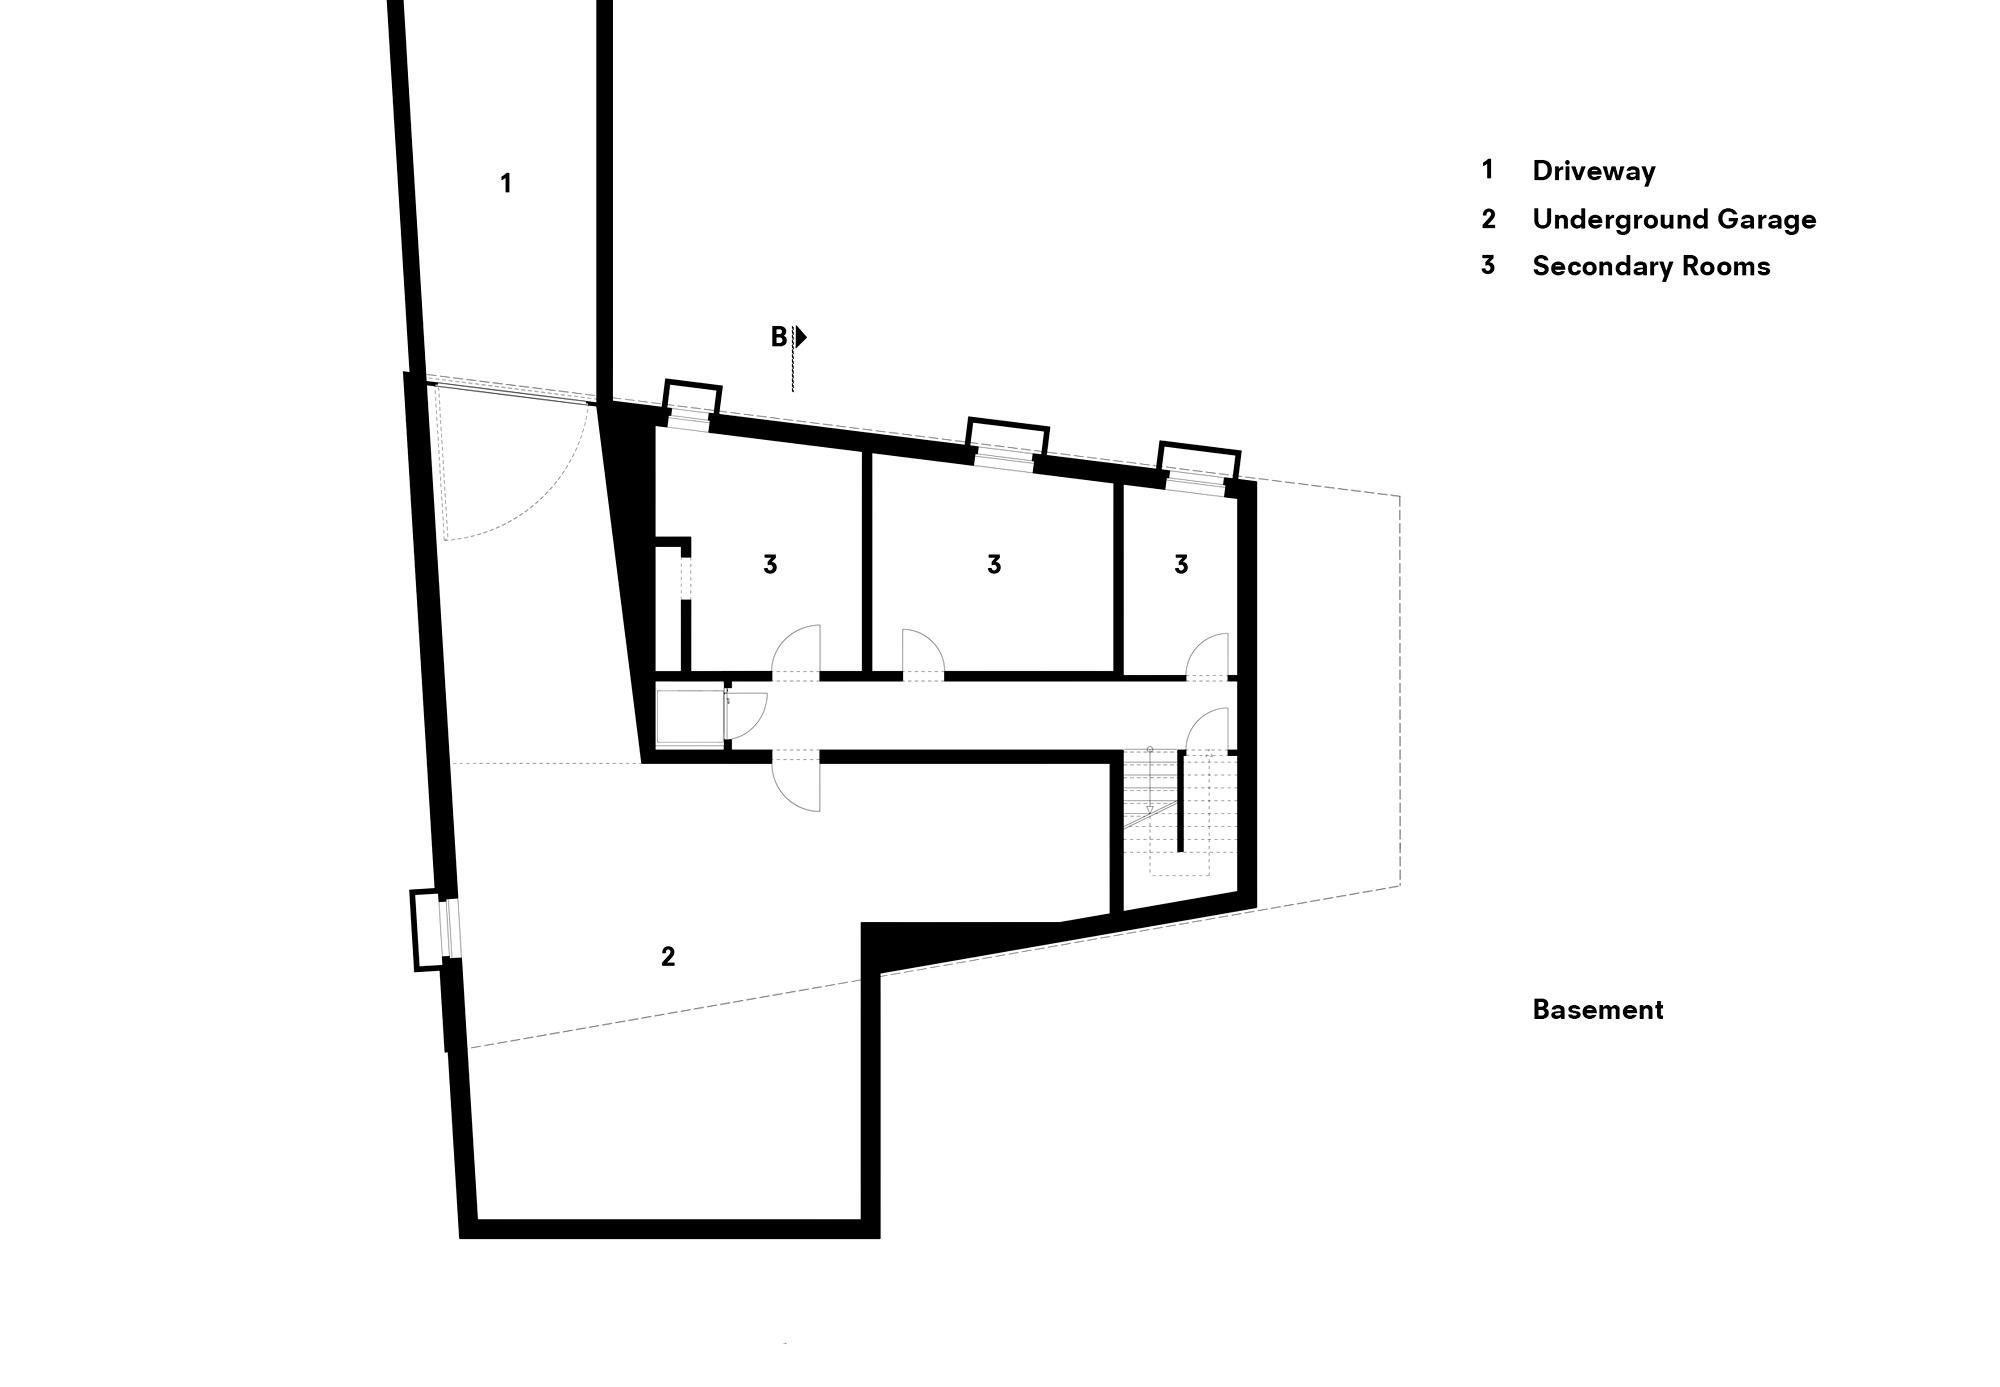 Lower Floor Plan - Koln House Luxury Residence - Hahnwald, Cologne, Germany